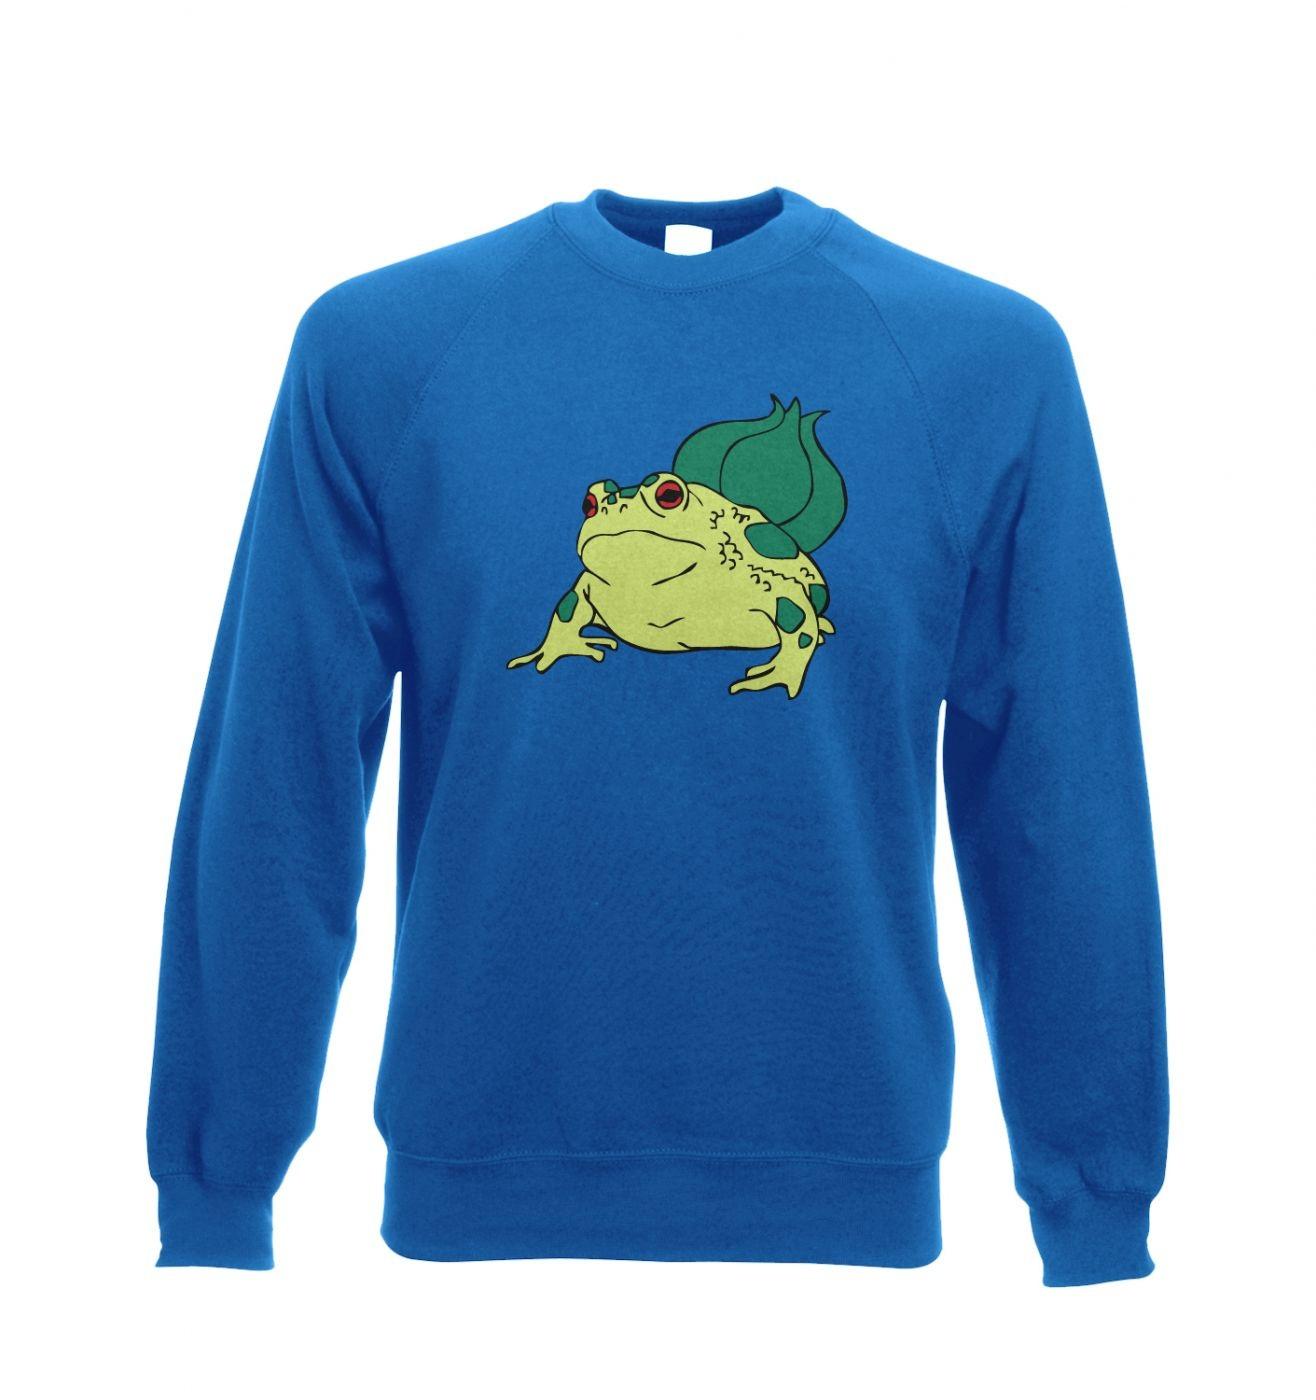 Real Life Bulbasaur Adult Crewneck Sweatshirt